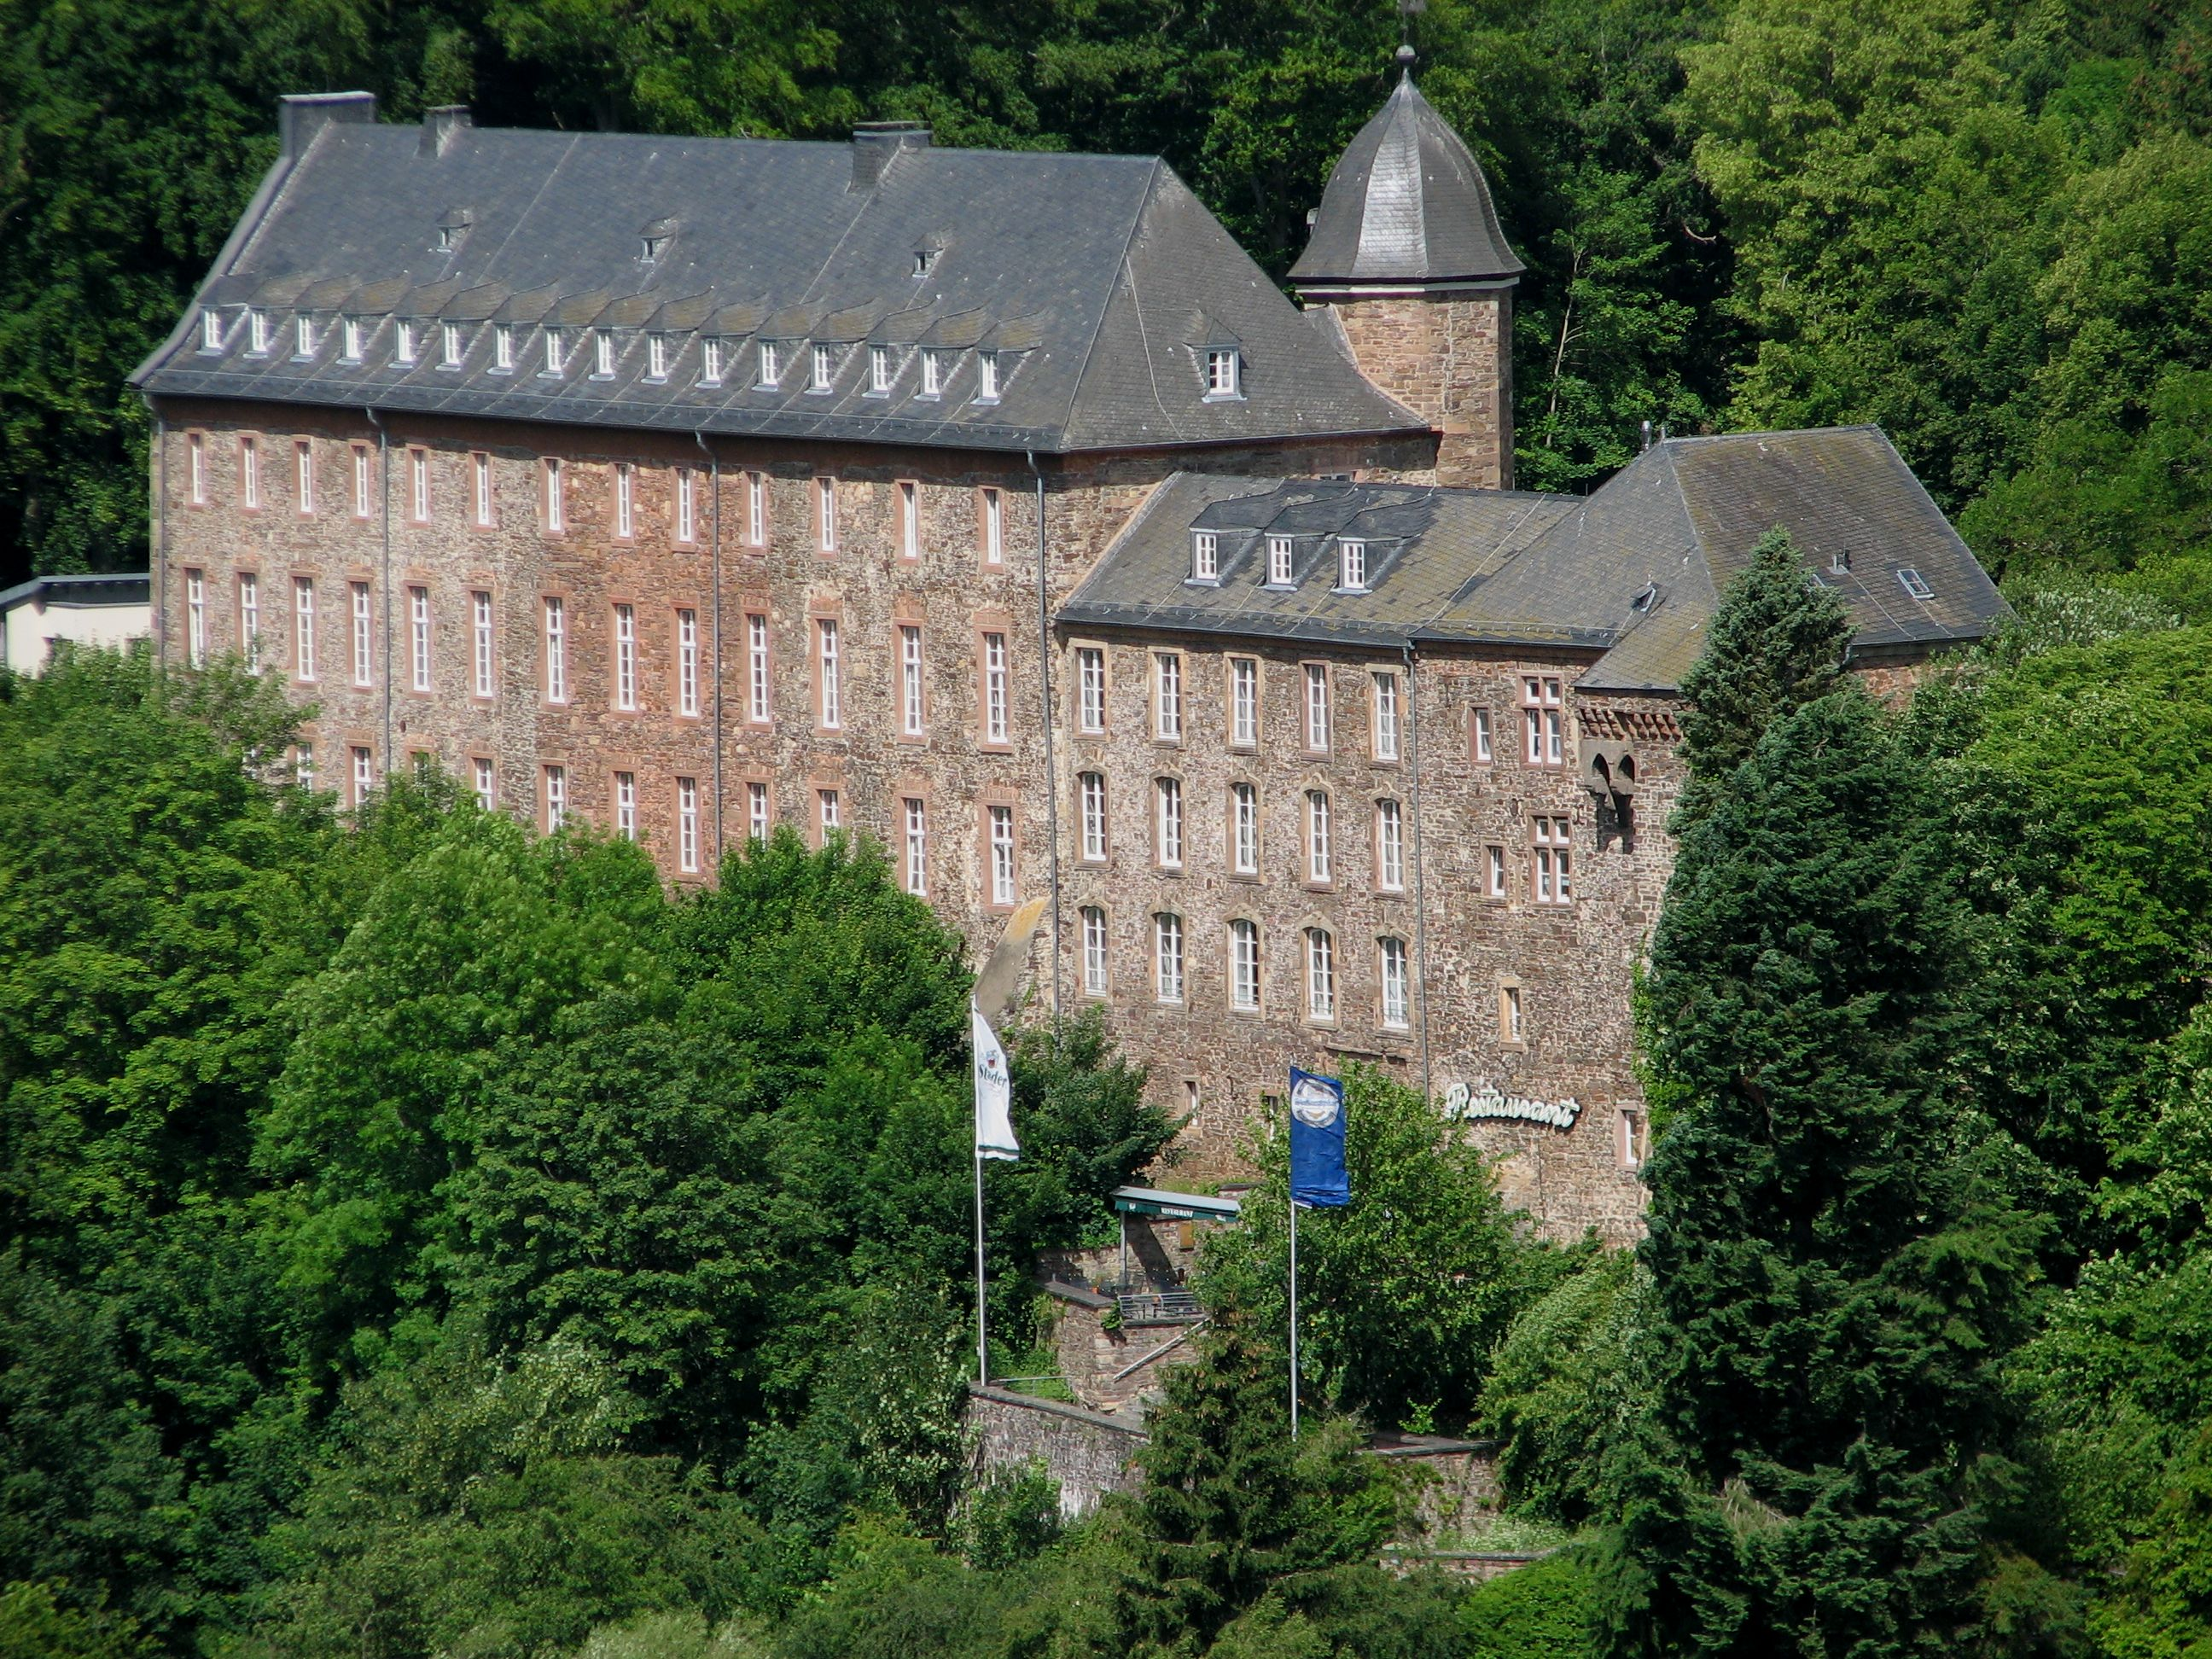 Restaurant Schloss Schleiden